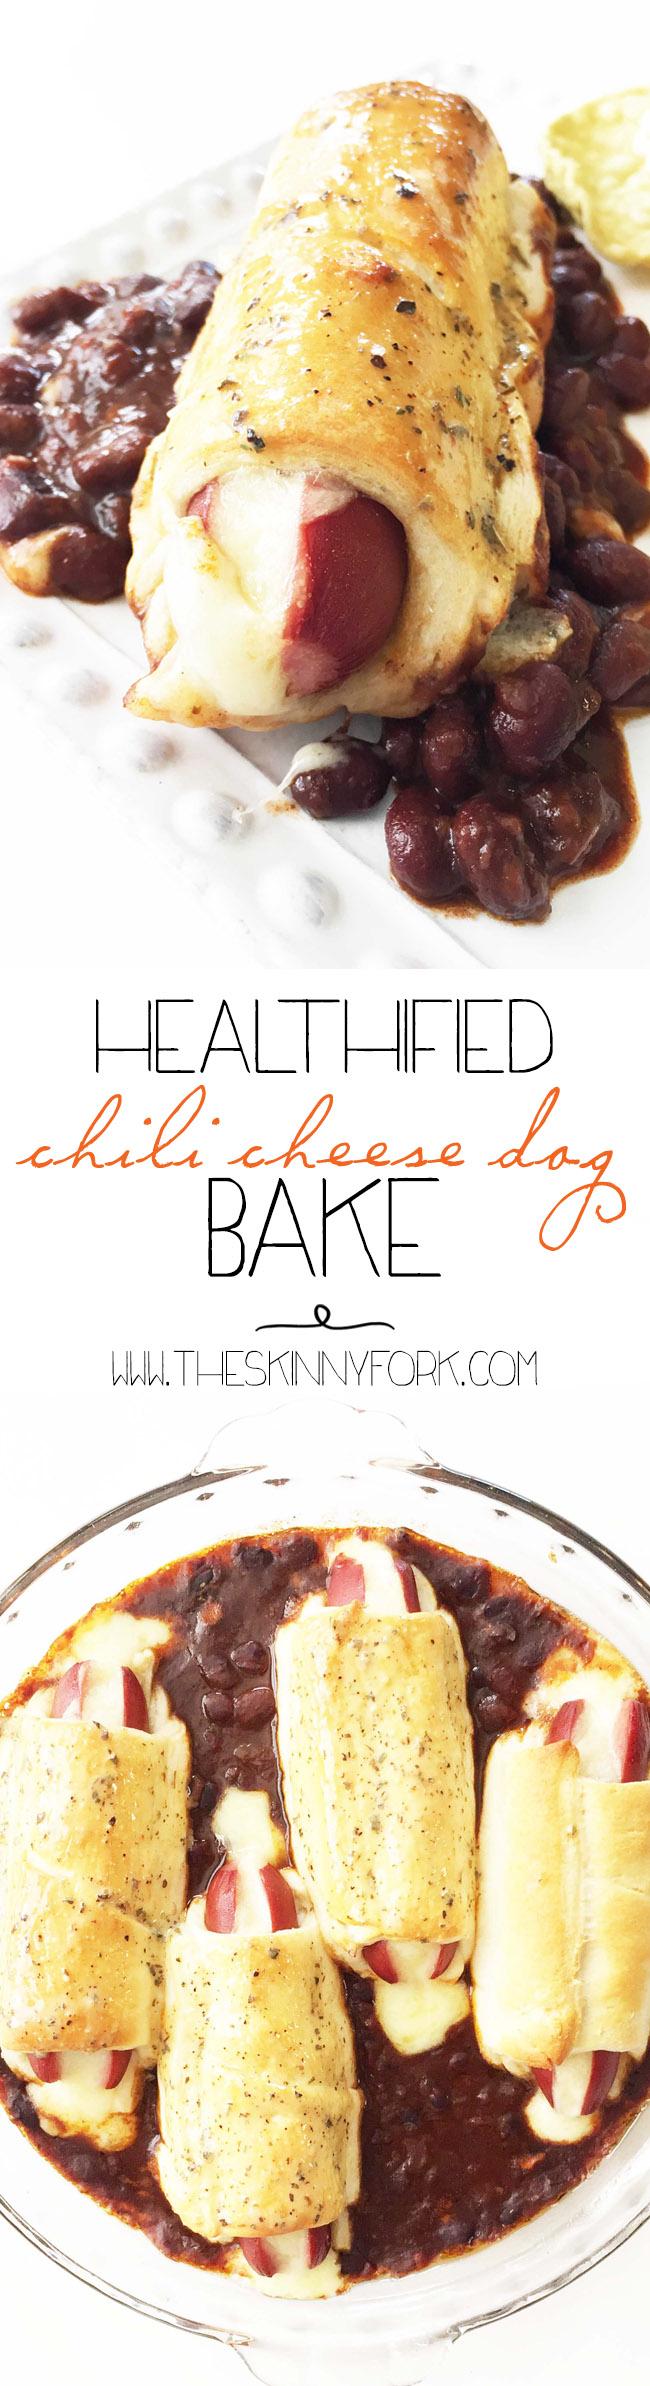 Healthified Chili Cheese Dog Bake | Food recipes, Chili ...